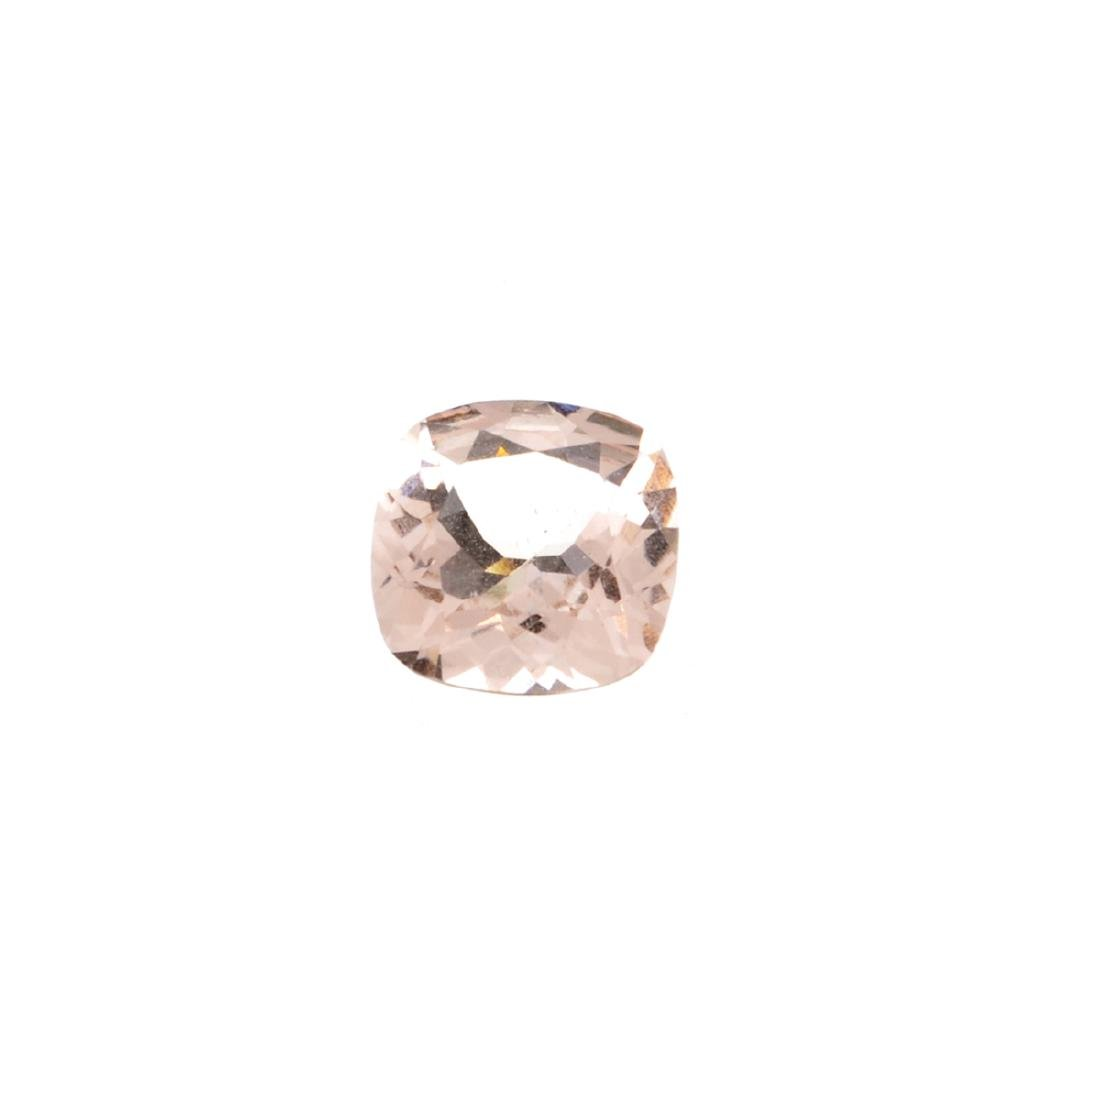 High End Rare 2.25CT Morganite Stone